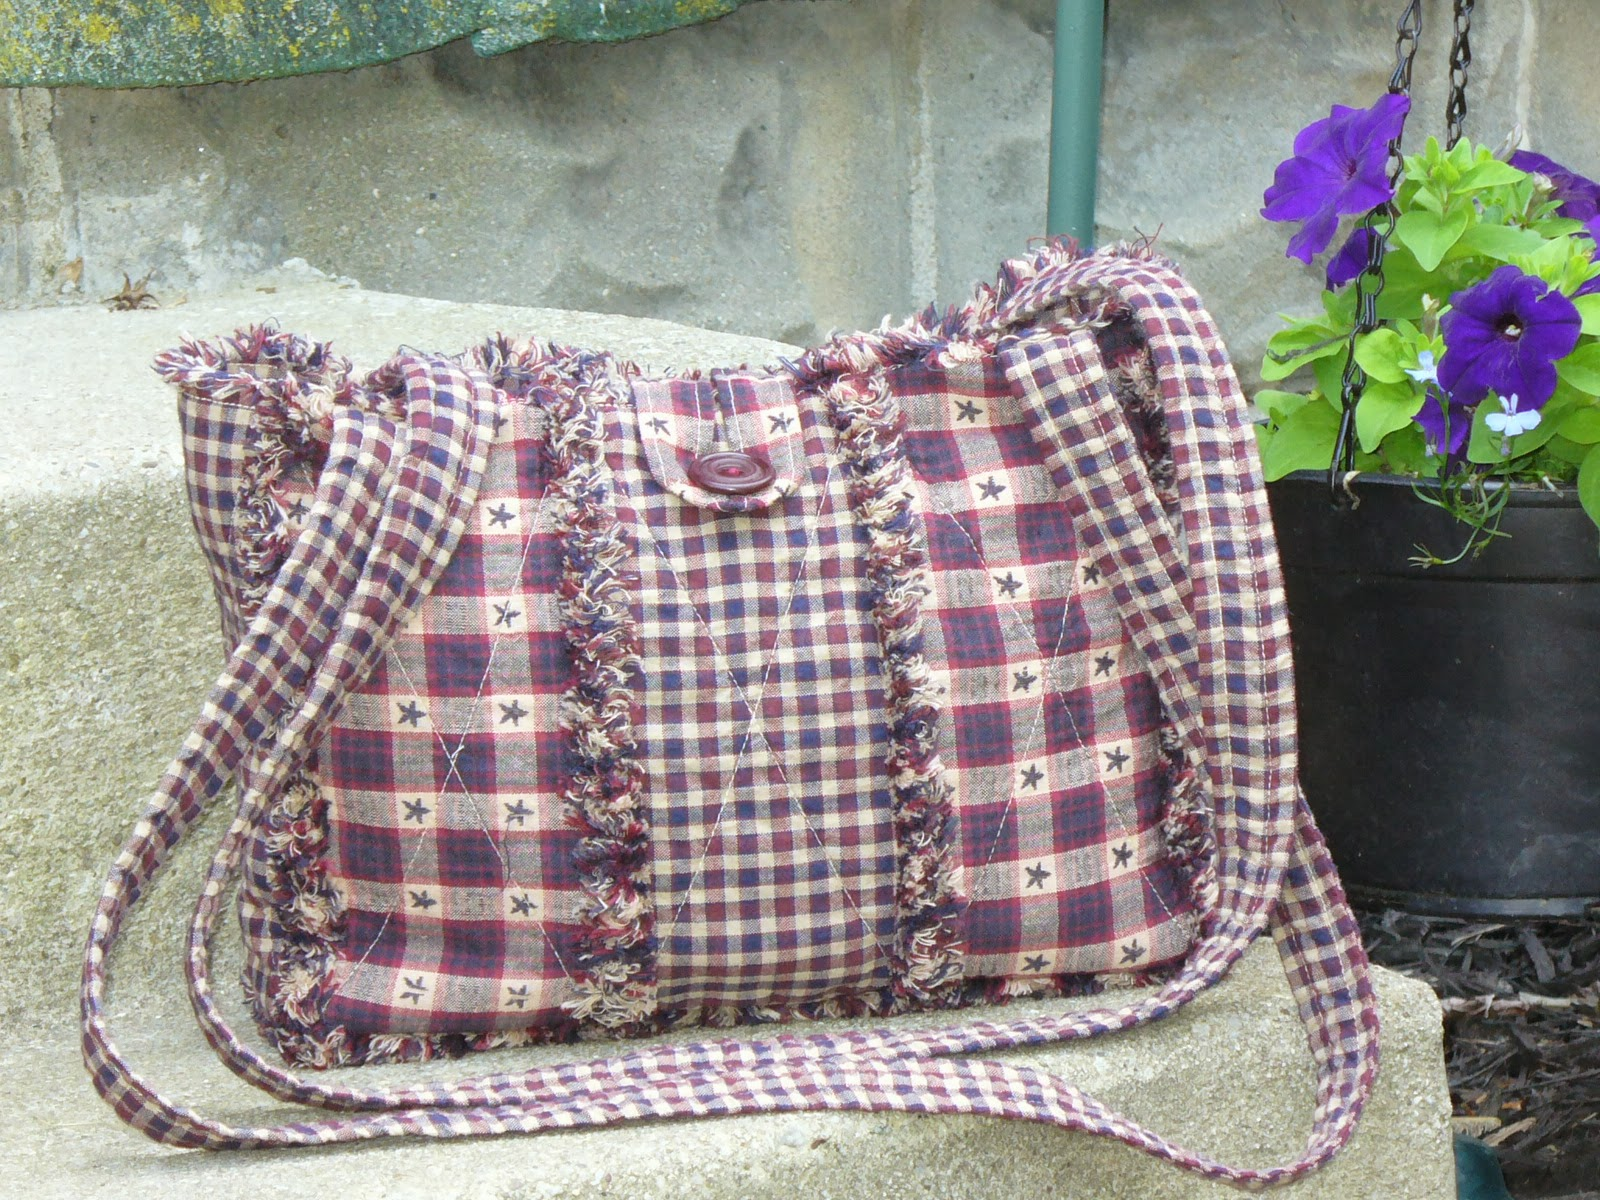 Rag Quilted Handbag Pattern : Ashlawnfarms Rag Quilt Creations: Homespun Patriotic Rag Quilt Purse